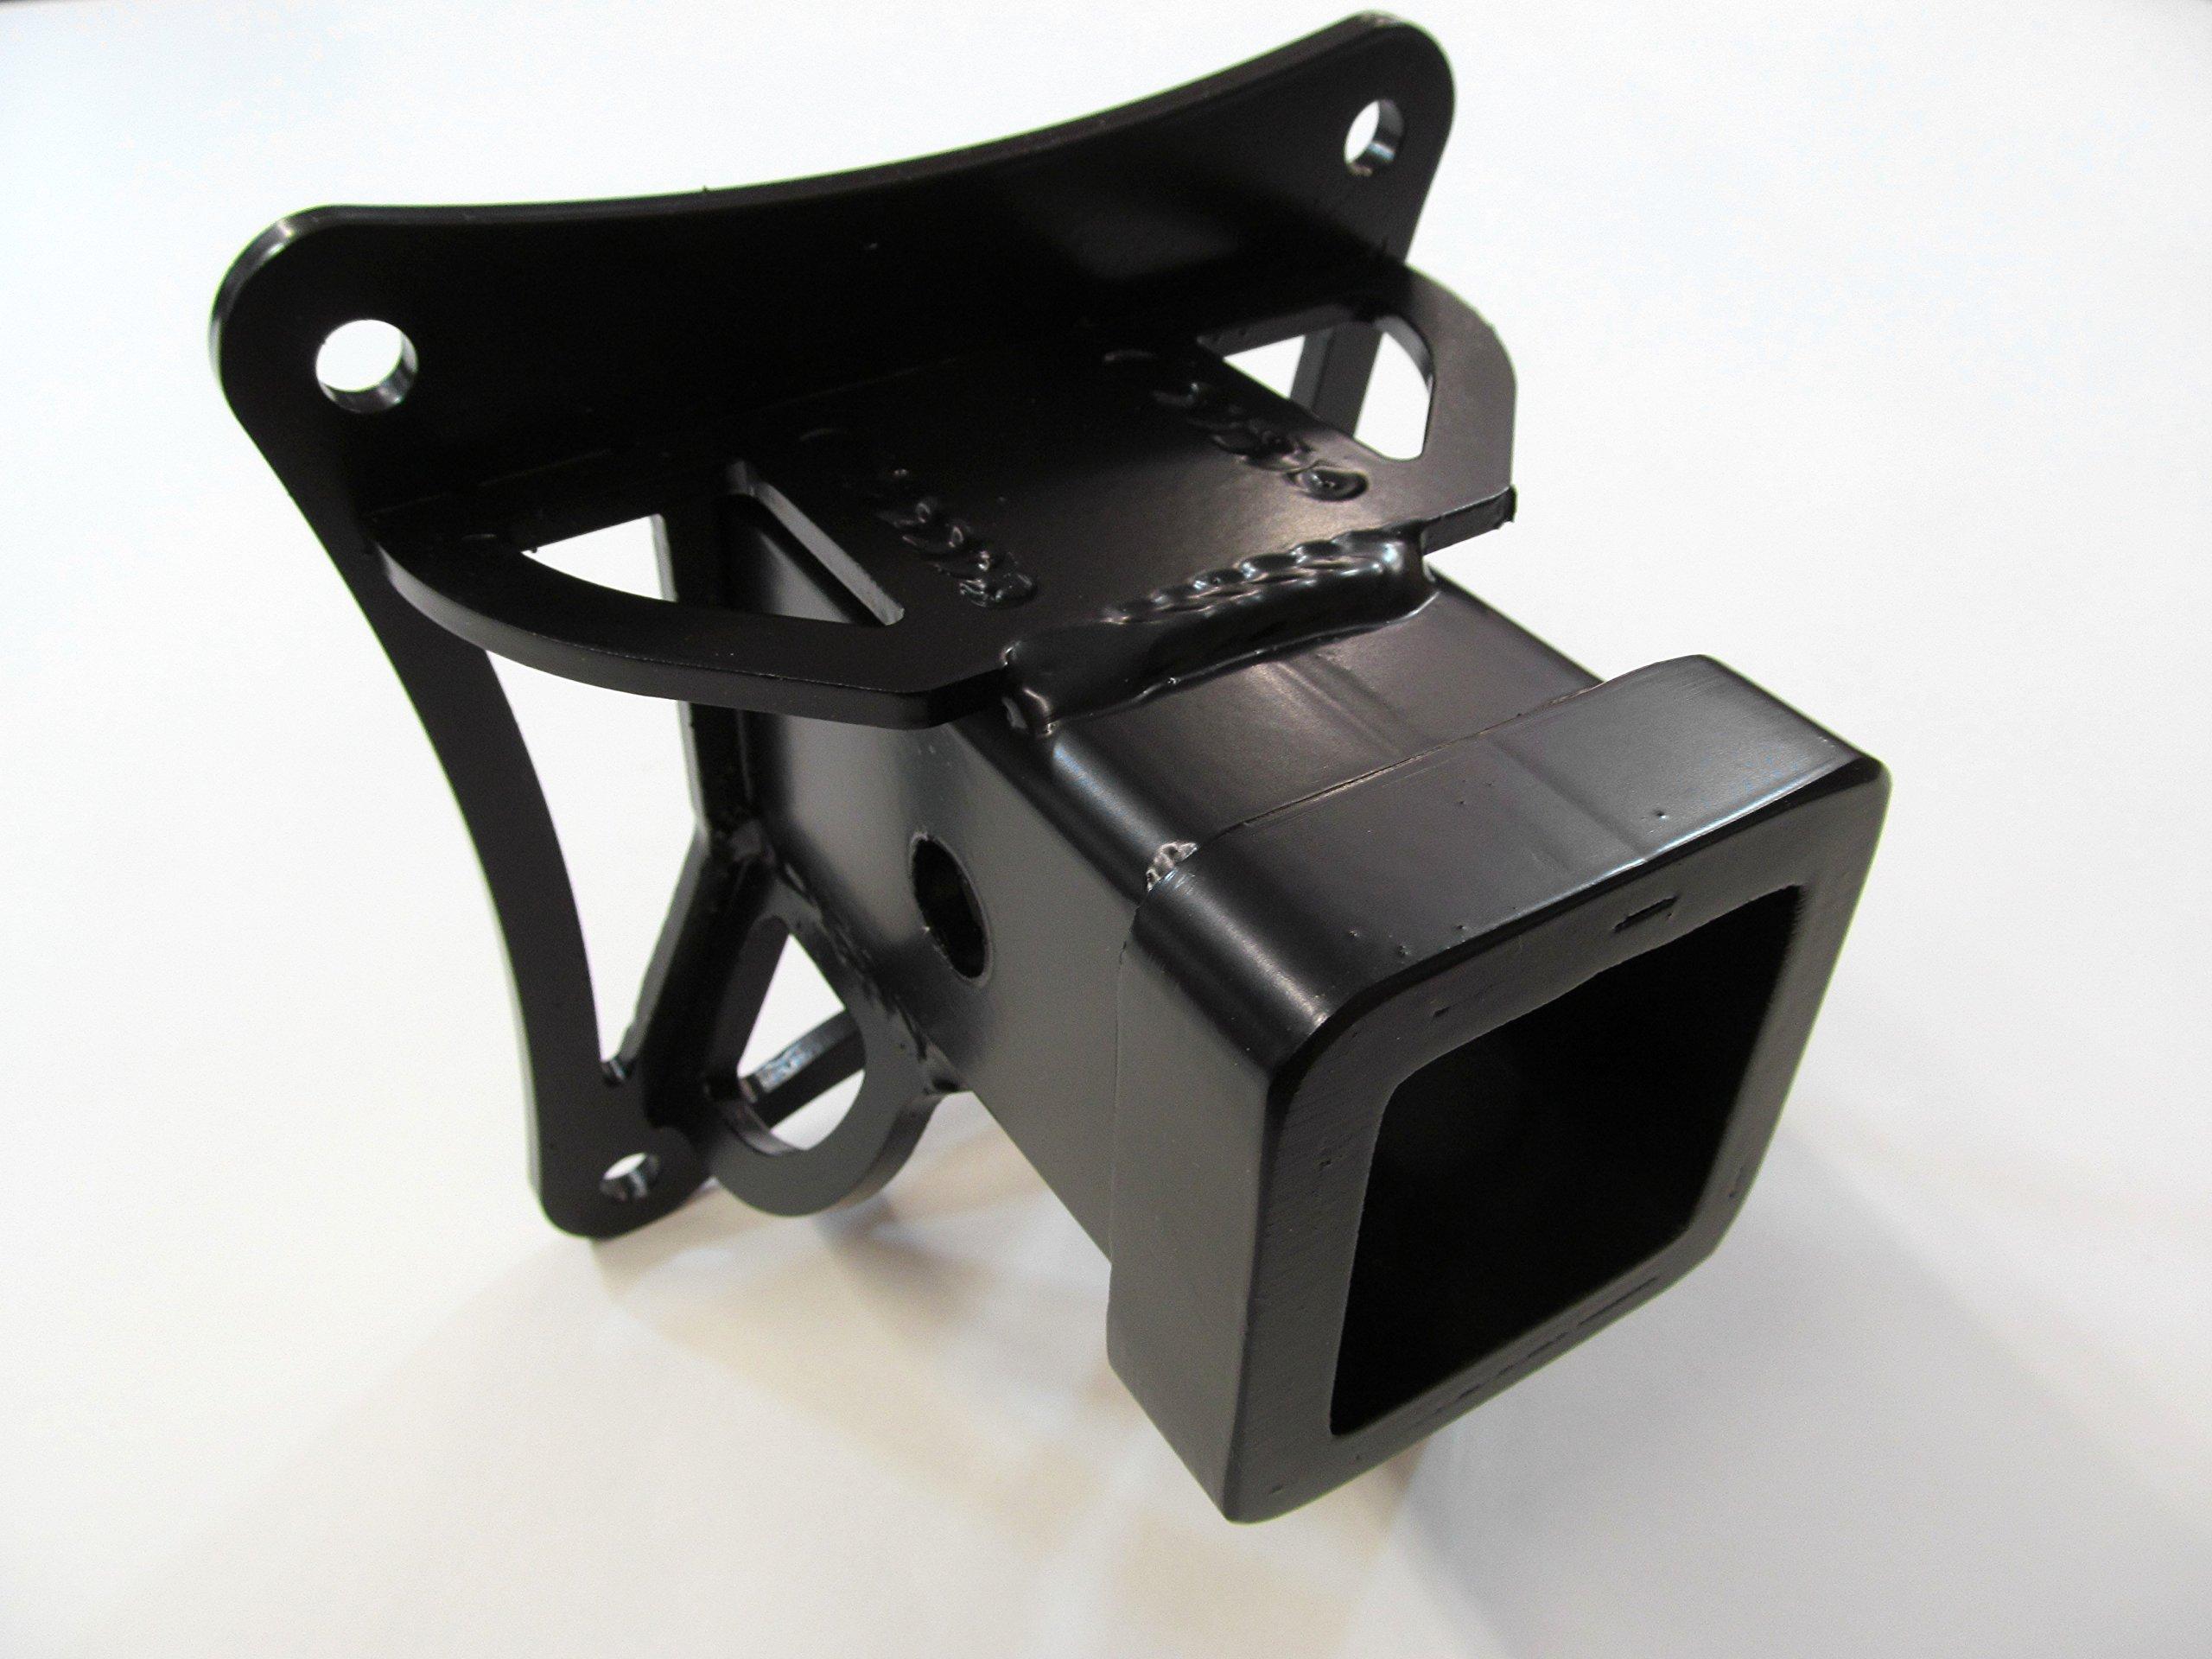 Polaris RZR XP 1000 bolt on reciever hitch by BoeschBuilt polaris Razor accessories